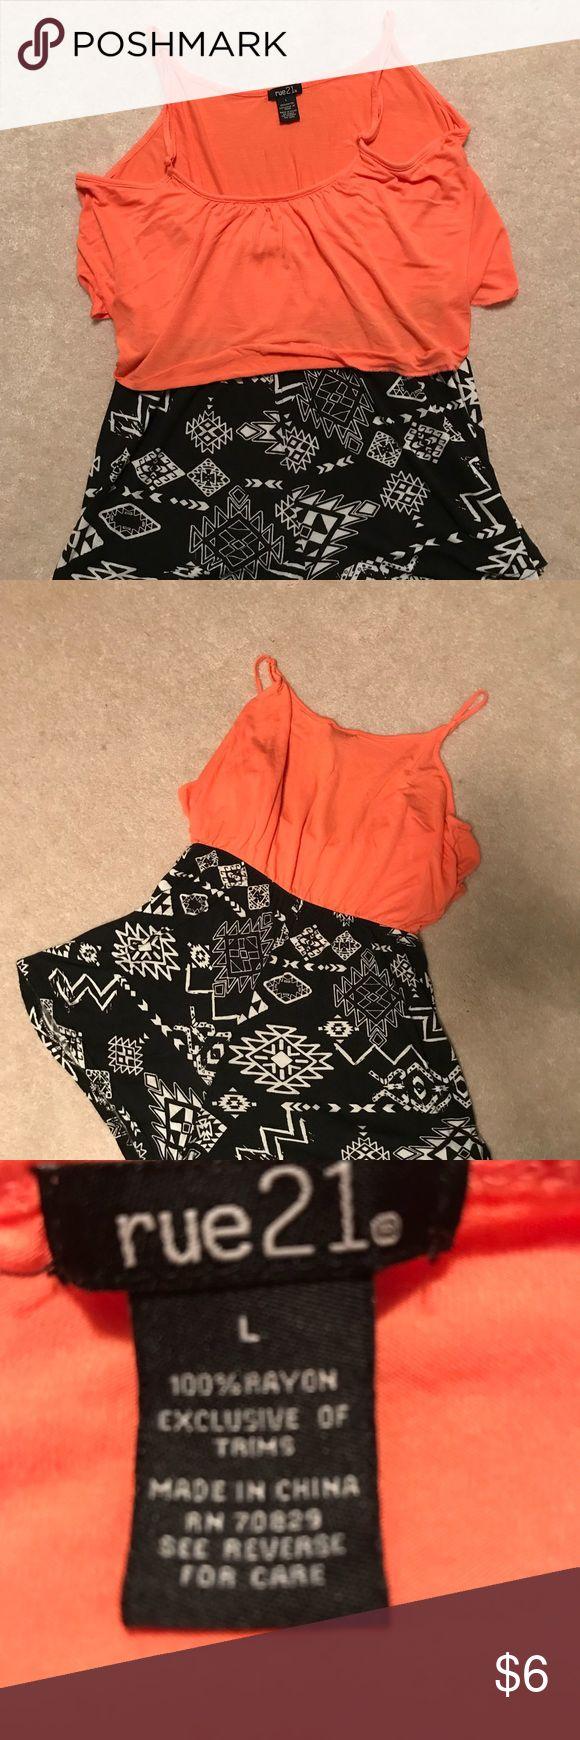 One piece,100% Rayon, Junior Rue 21, Junior, one piece, light orange top, black, with white pattern bottom. Adjustable strap Rue 21 Other